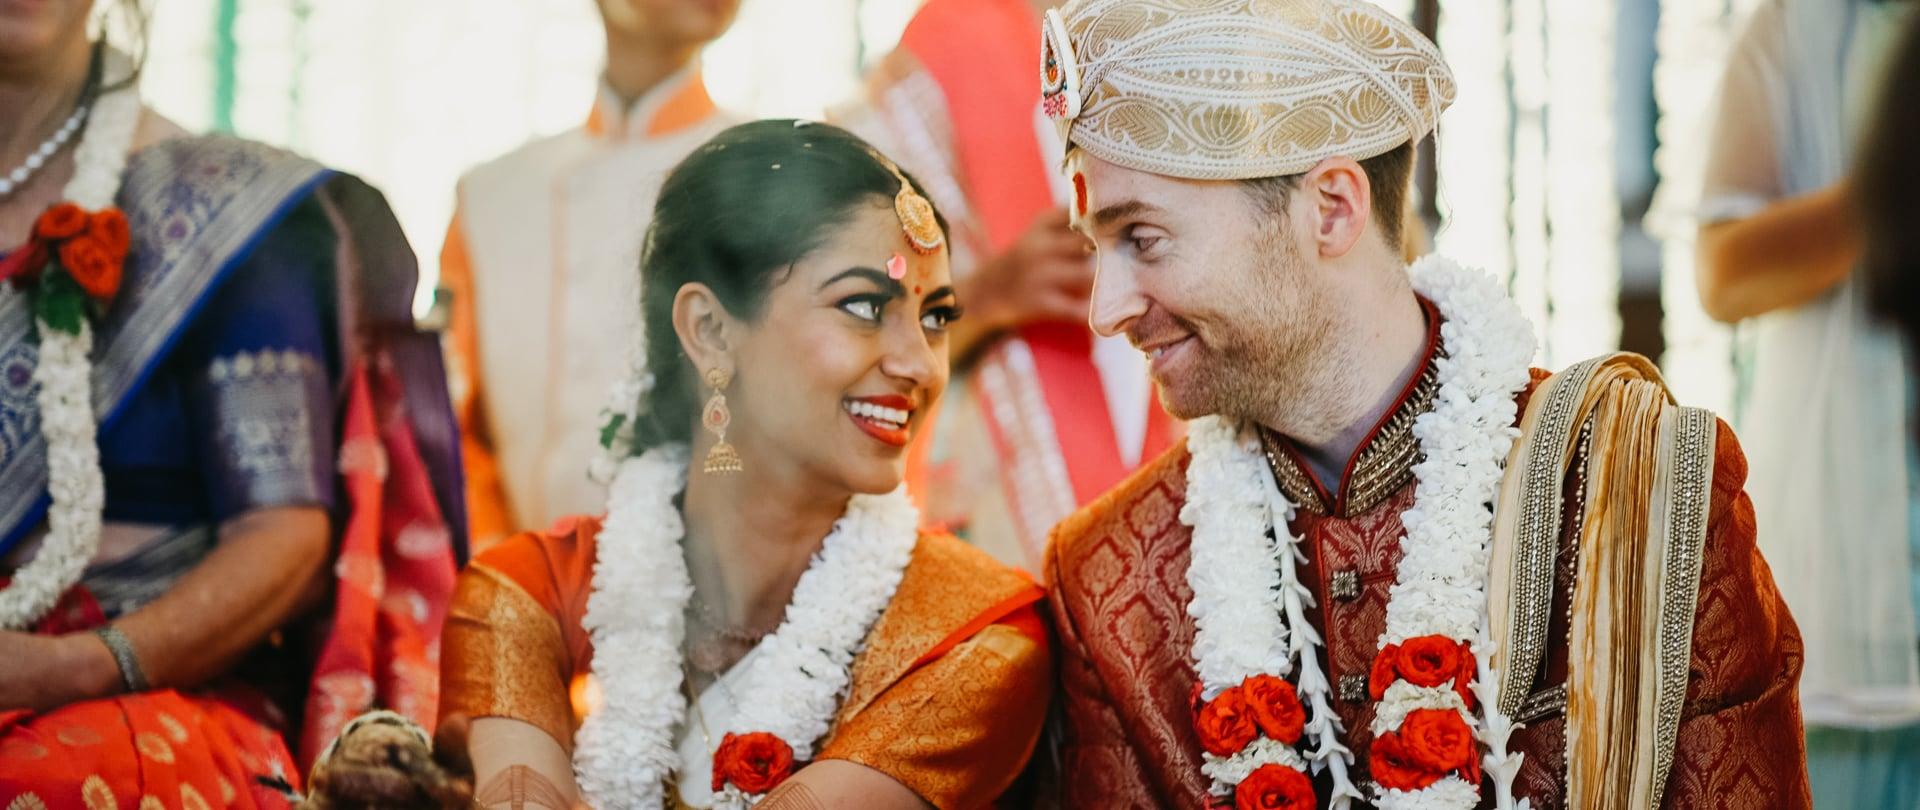 Priya & Alex Wedding Video Filmed at India, Asia